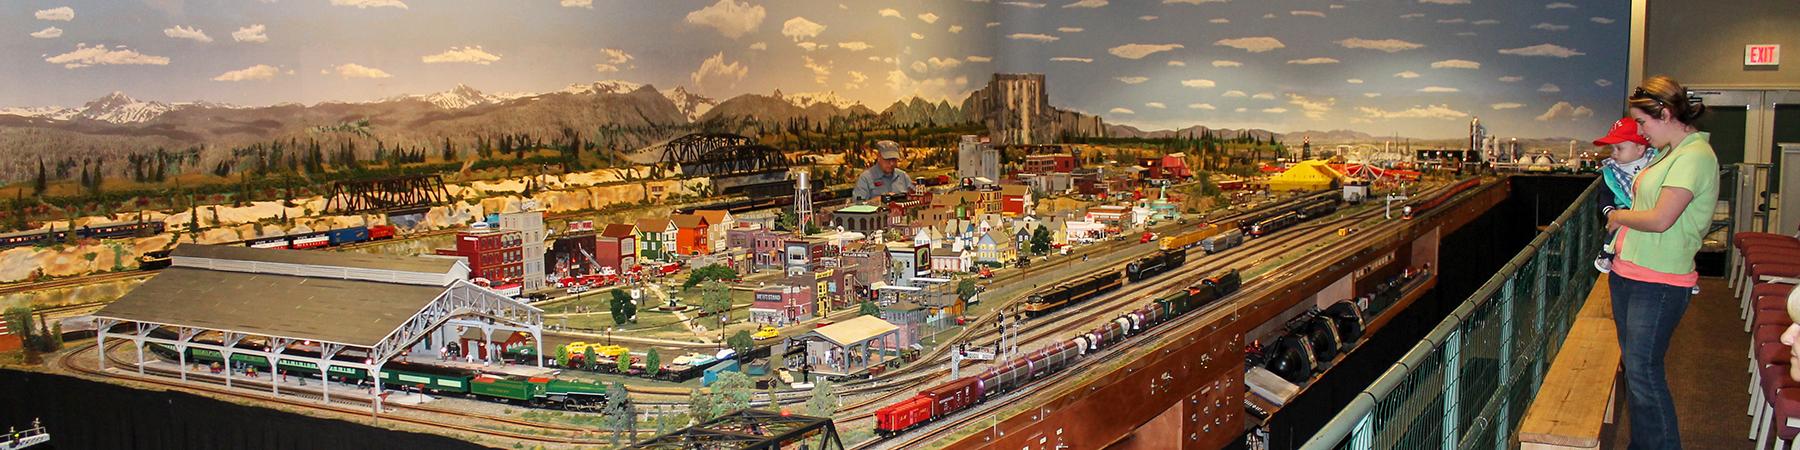 Foley, Alabama, Model Train, Museum, Railroad Museum, Model Trains